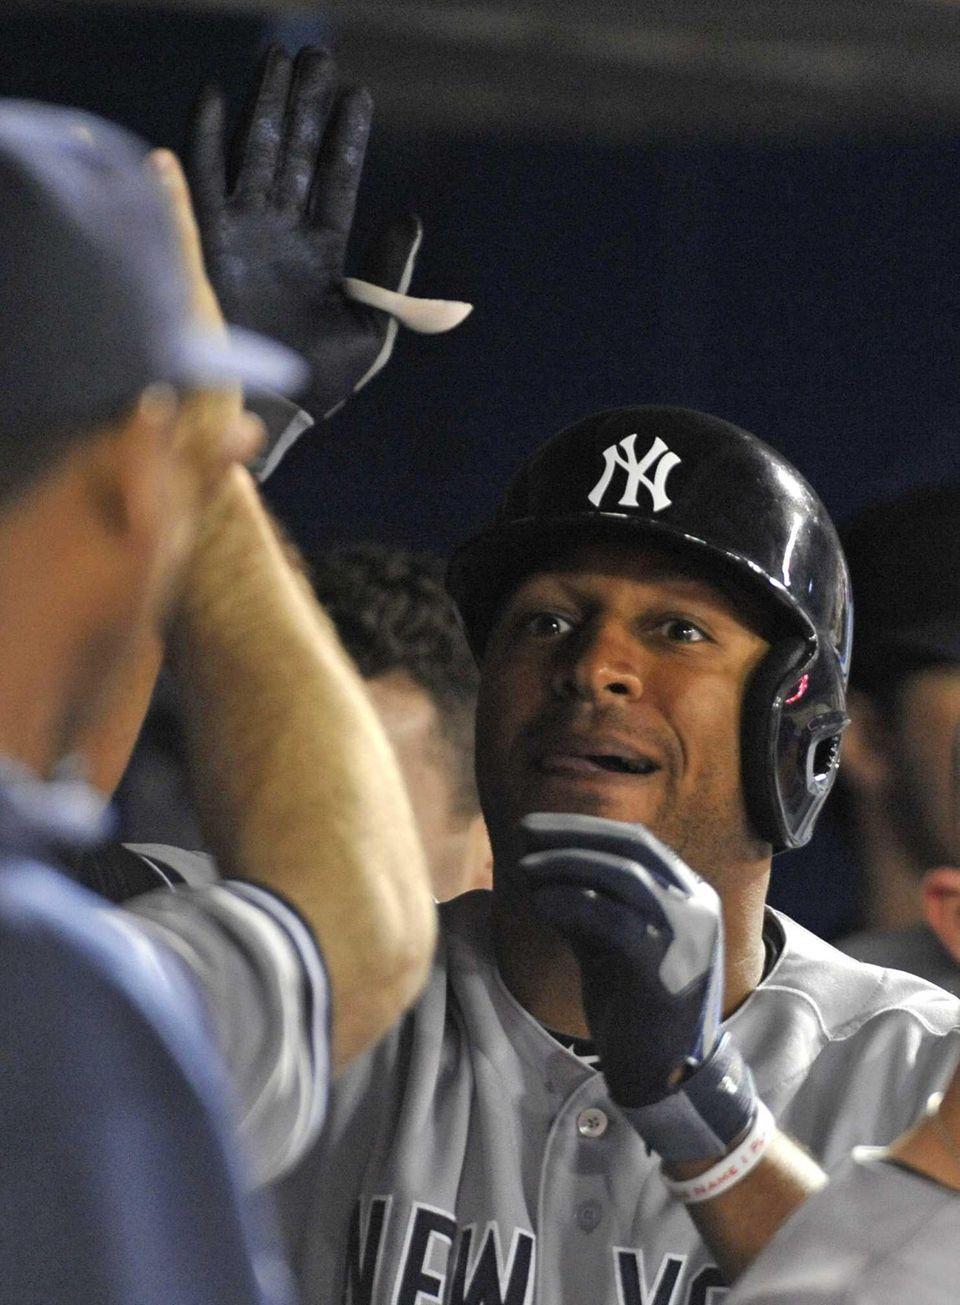 Vernon Wells celebrates a second inning home run